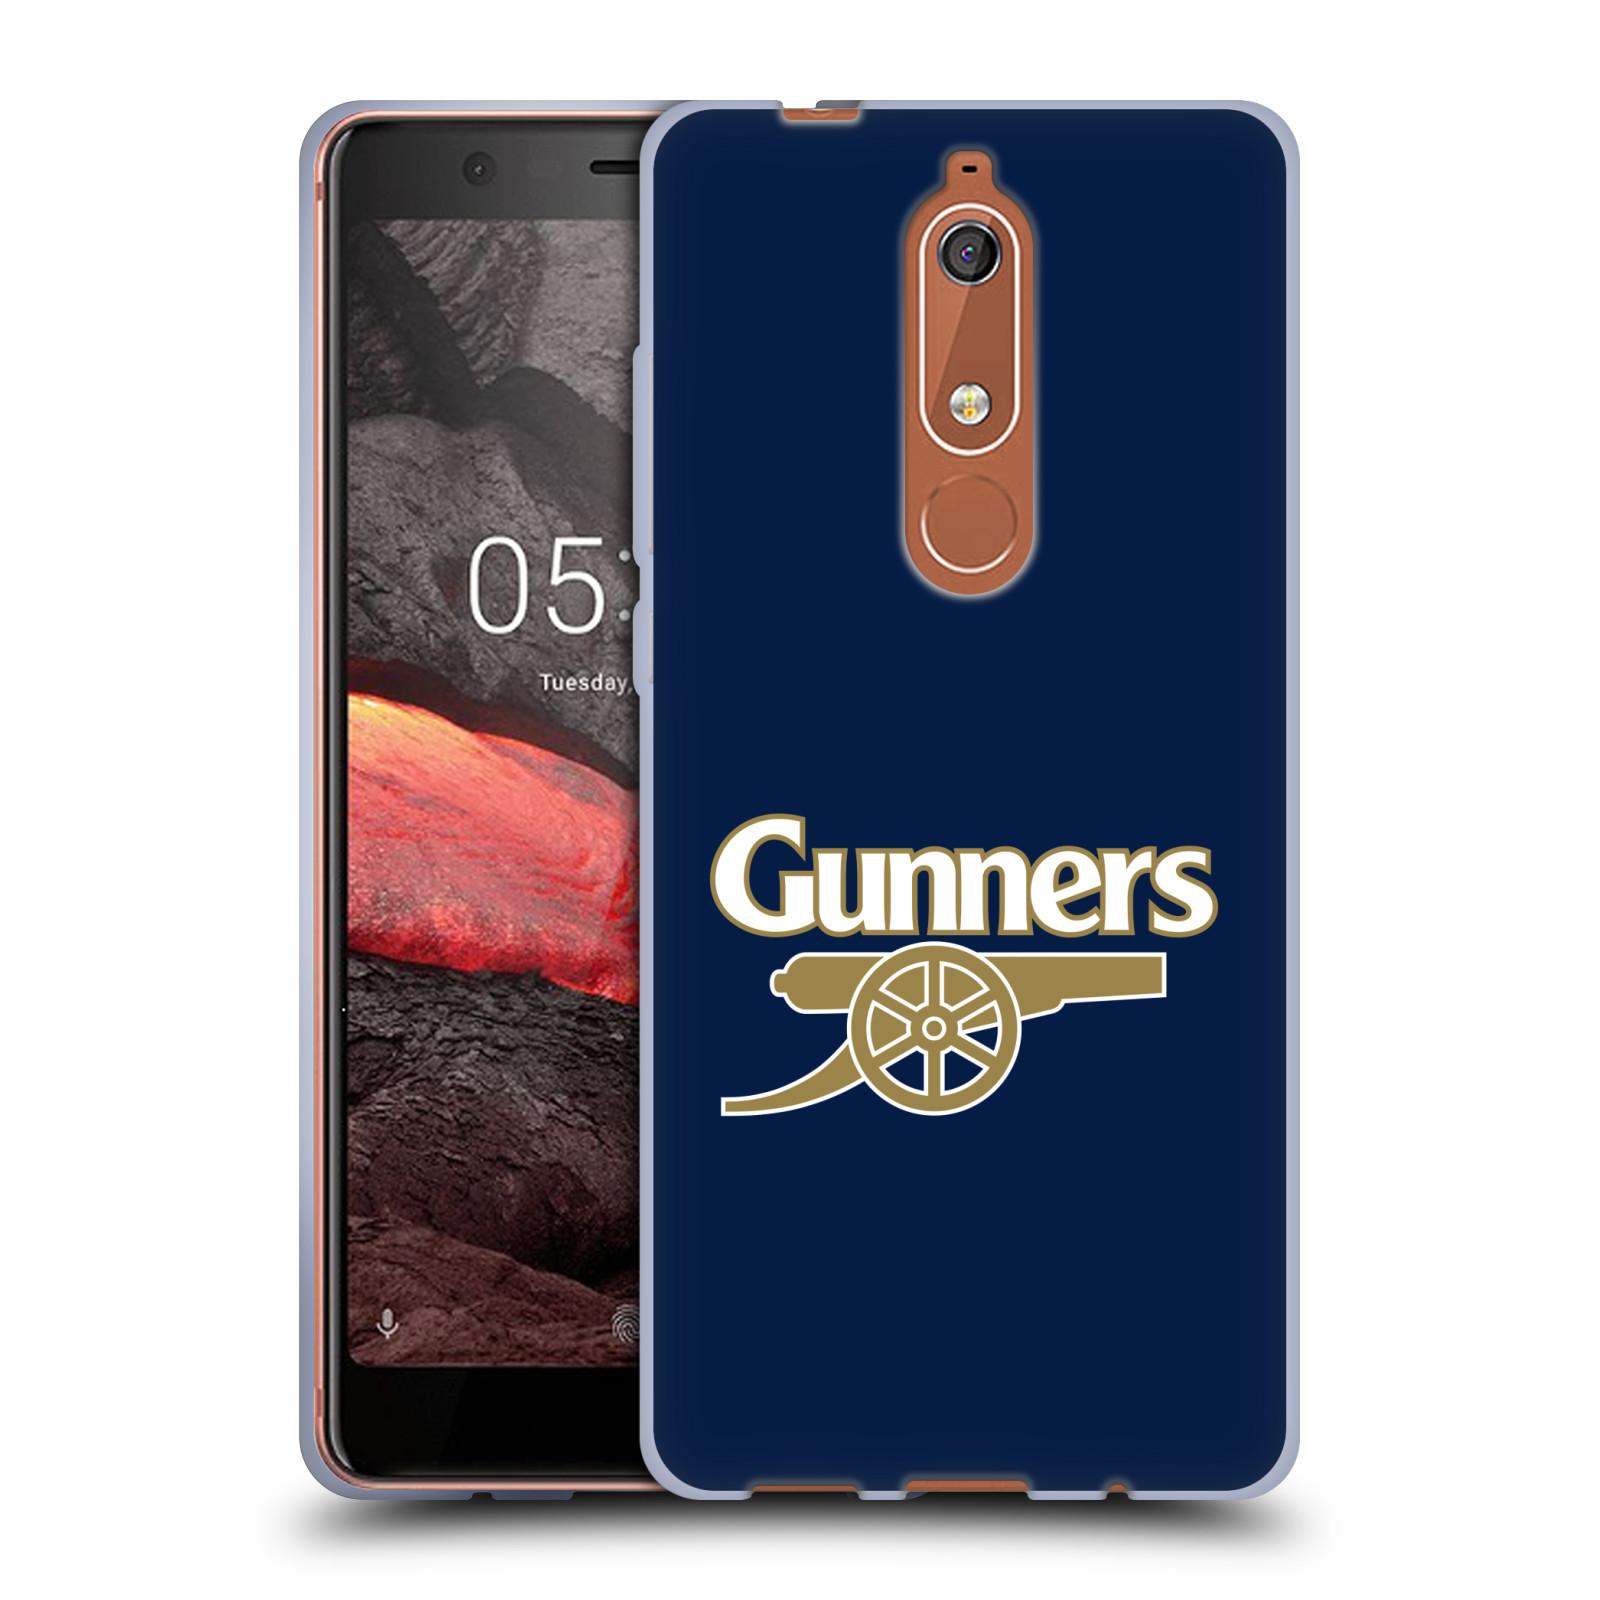 Silikonové pouzdro na mobil Nokia 5.1 - Head Case - Arsenal FC - Gunners